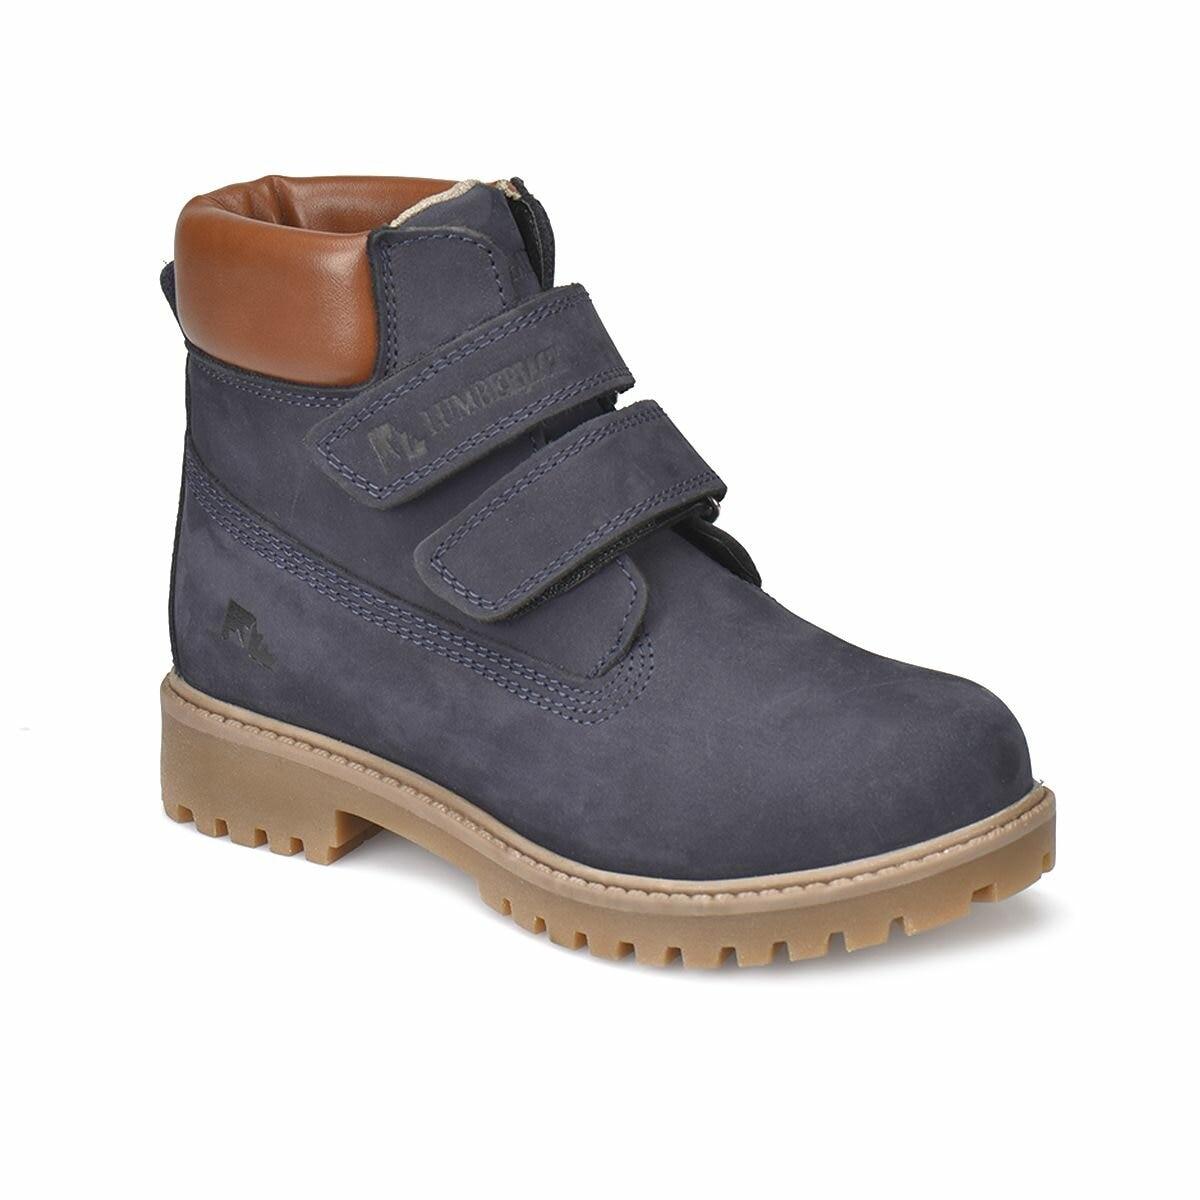 FLO RIVER Navy Blue Unisex Child Boots LUMBERJACK